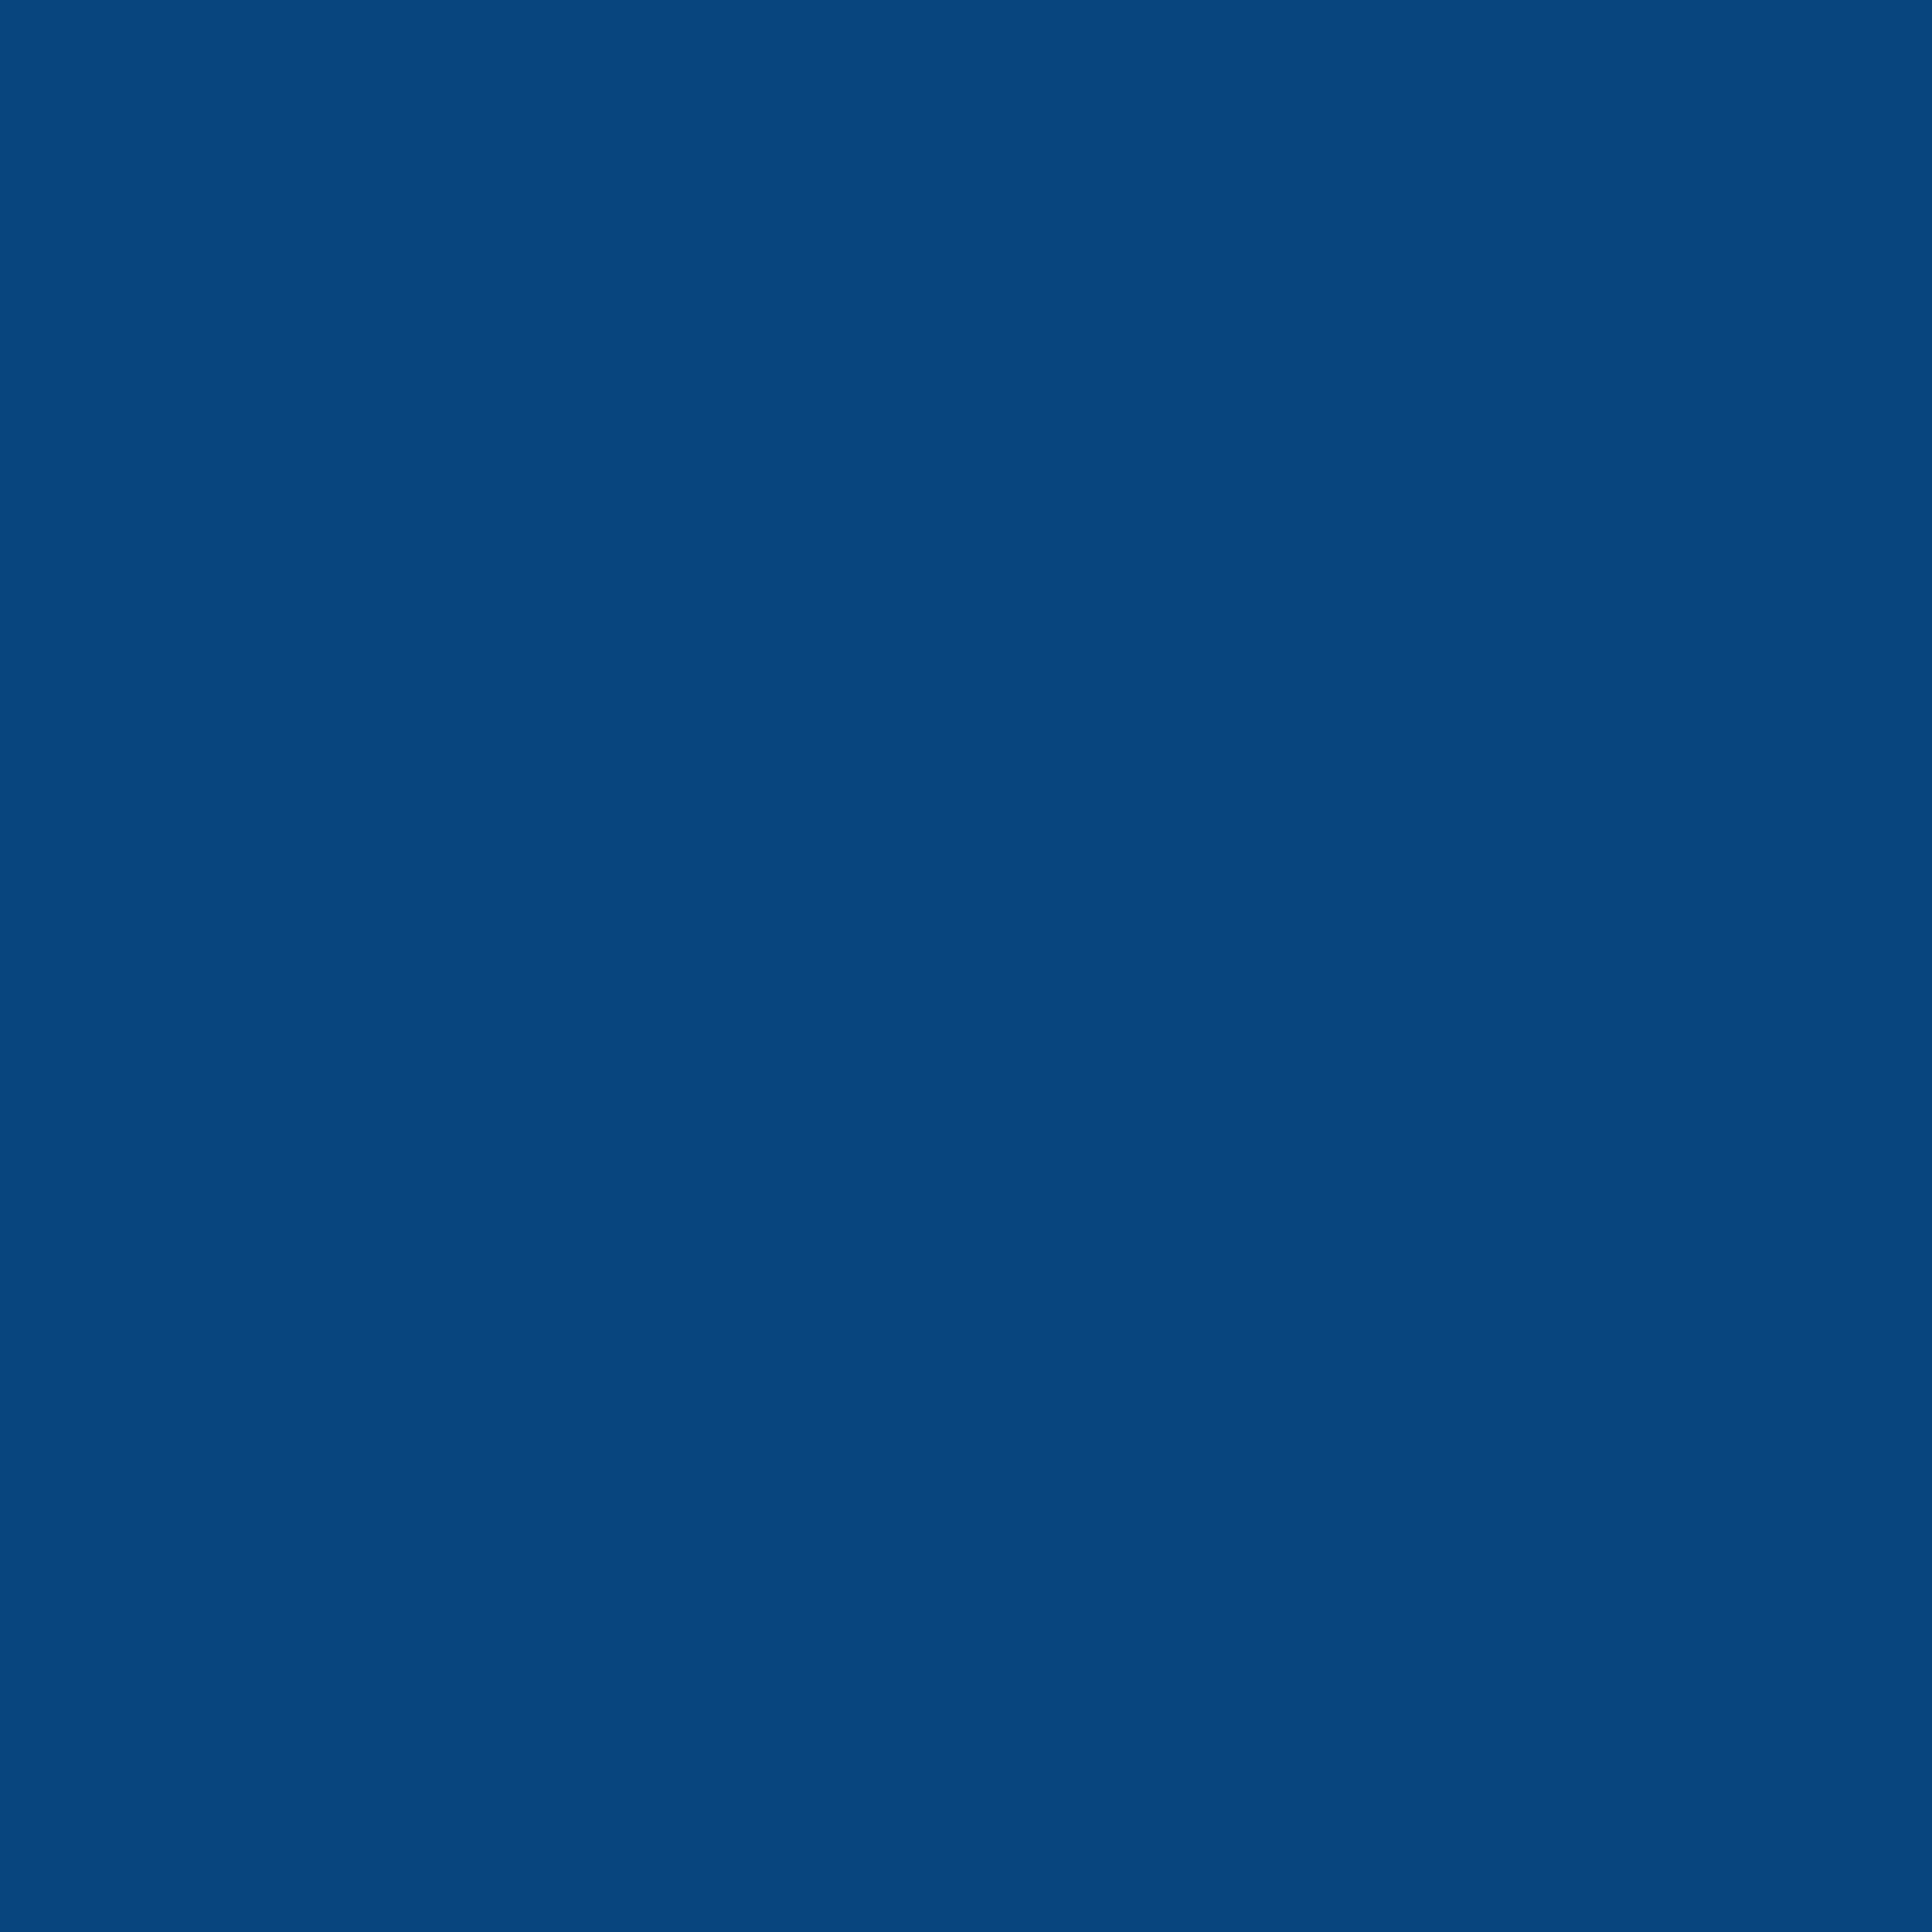 3600x3600 Dark Cerulean Solid Color Background